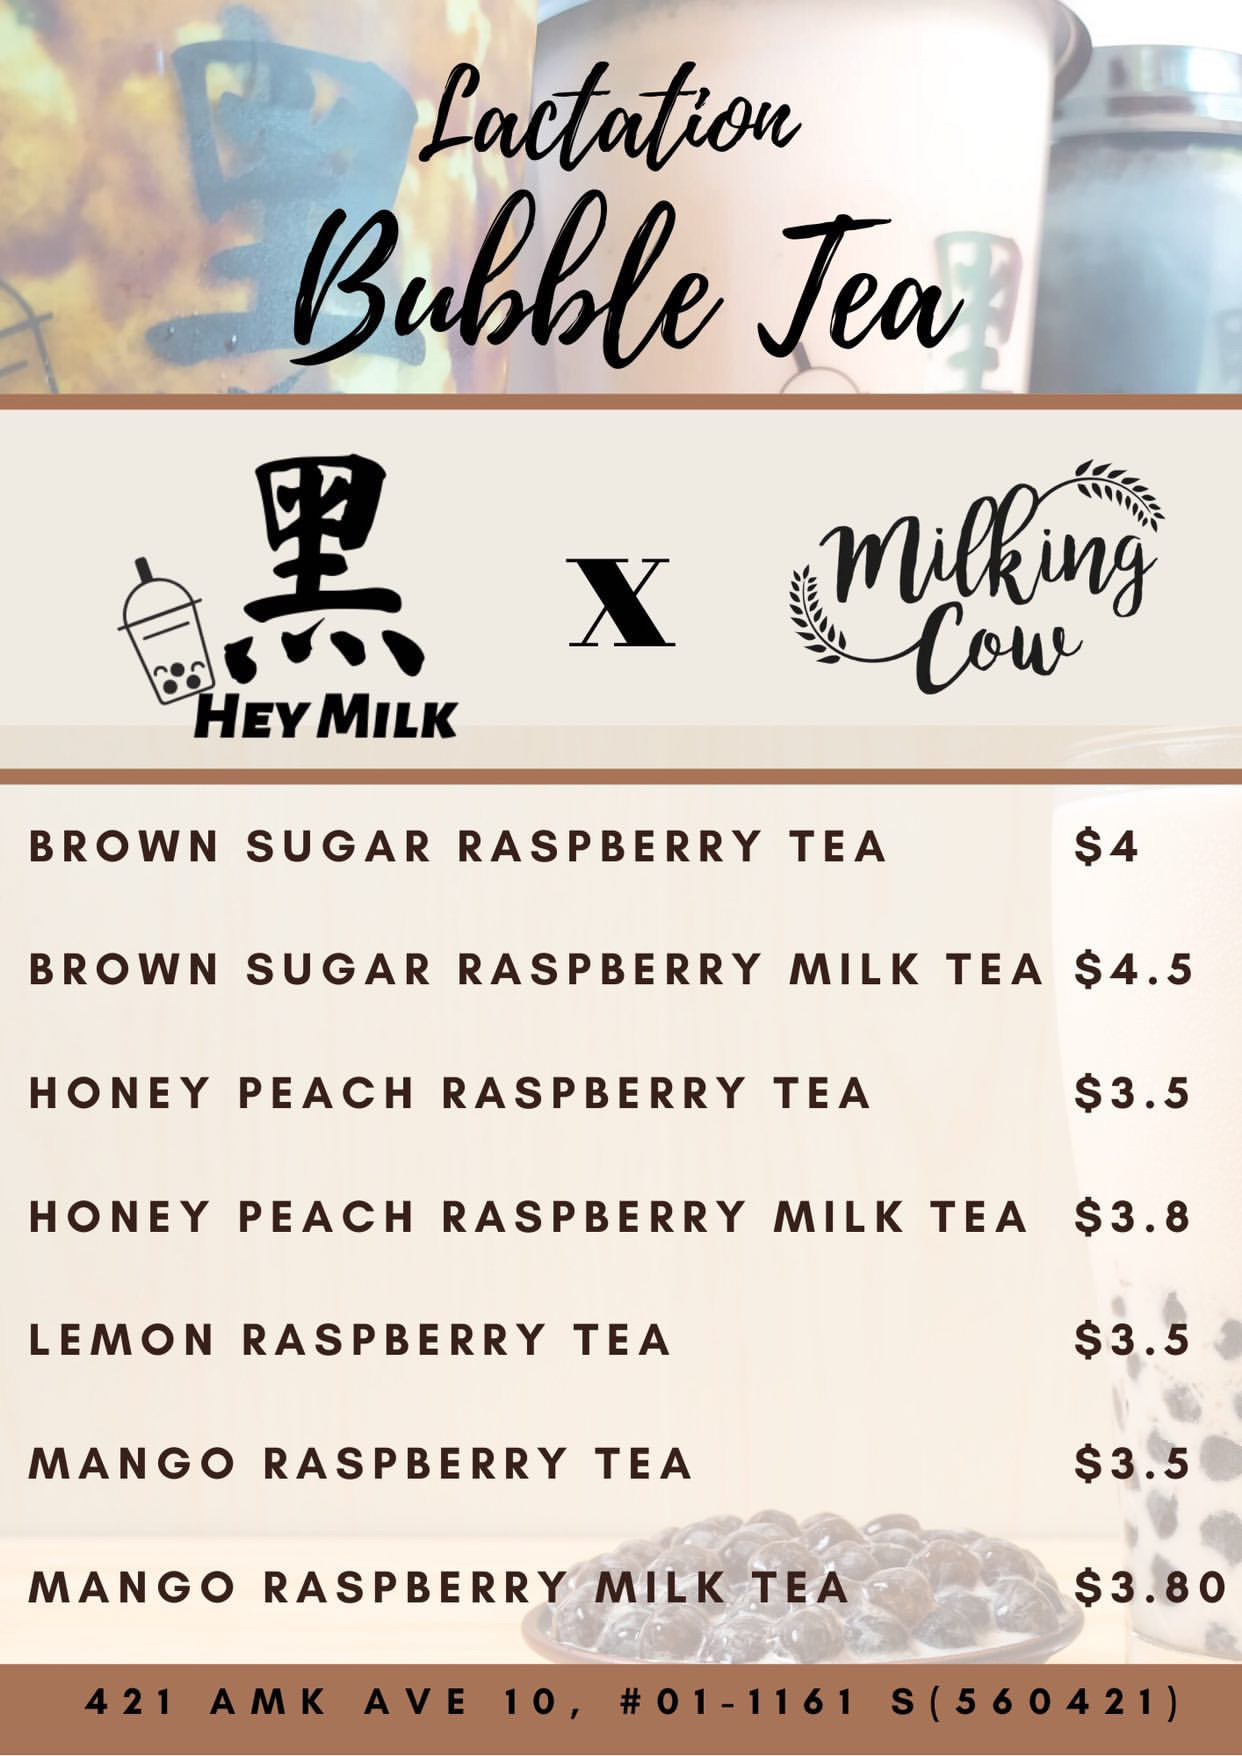 Lactation bubble tea